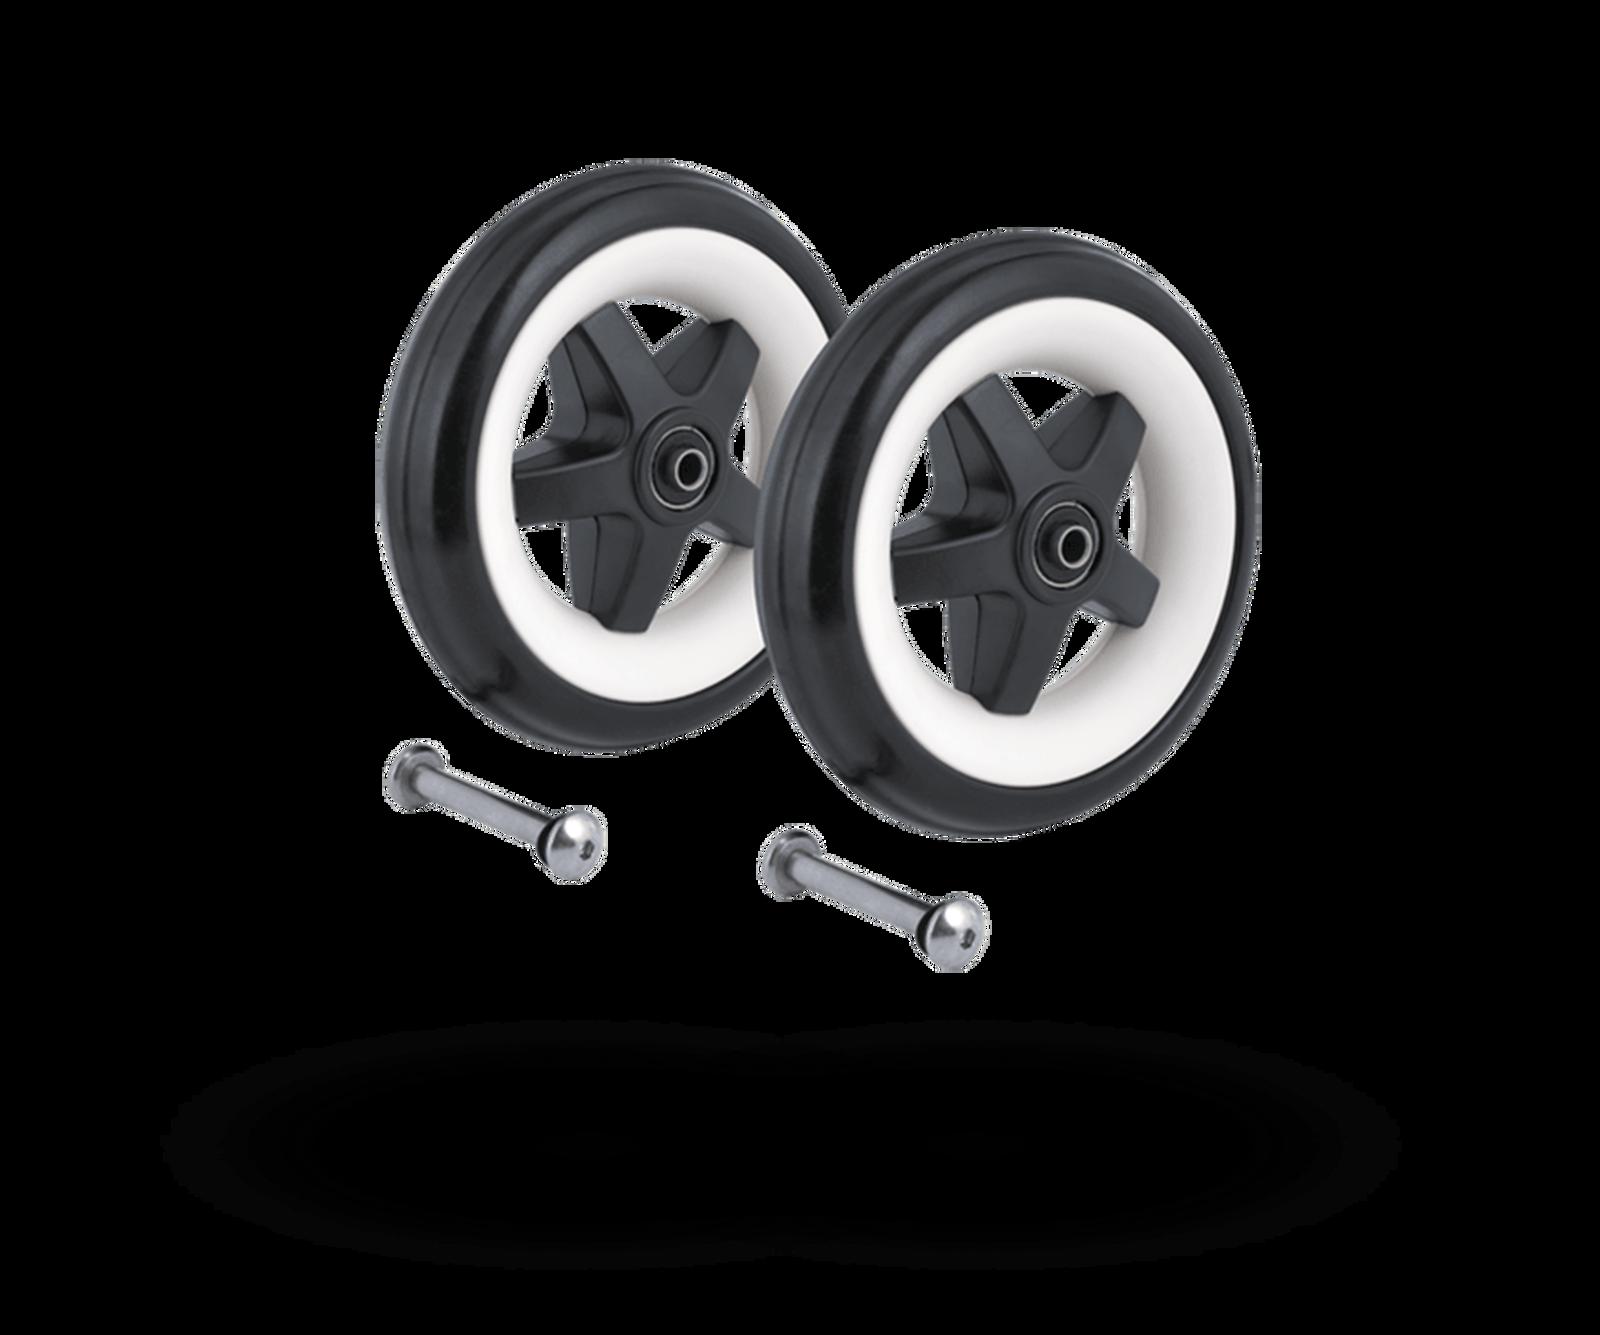 Bugaboo Bee (2010 model) rear wheels replacement set Black